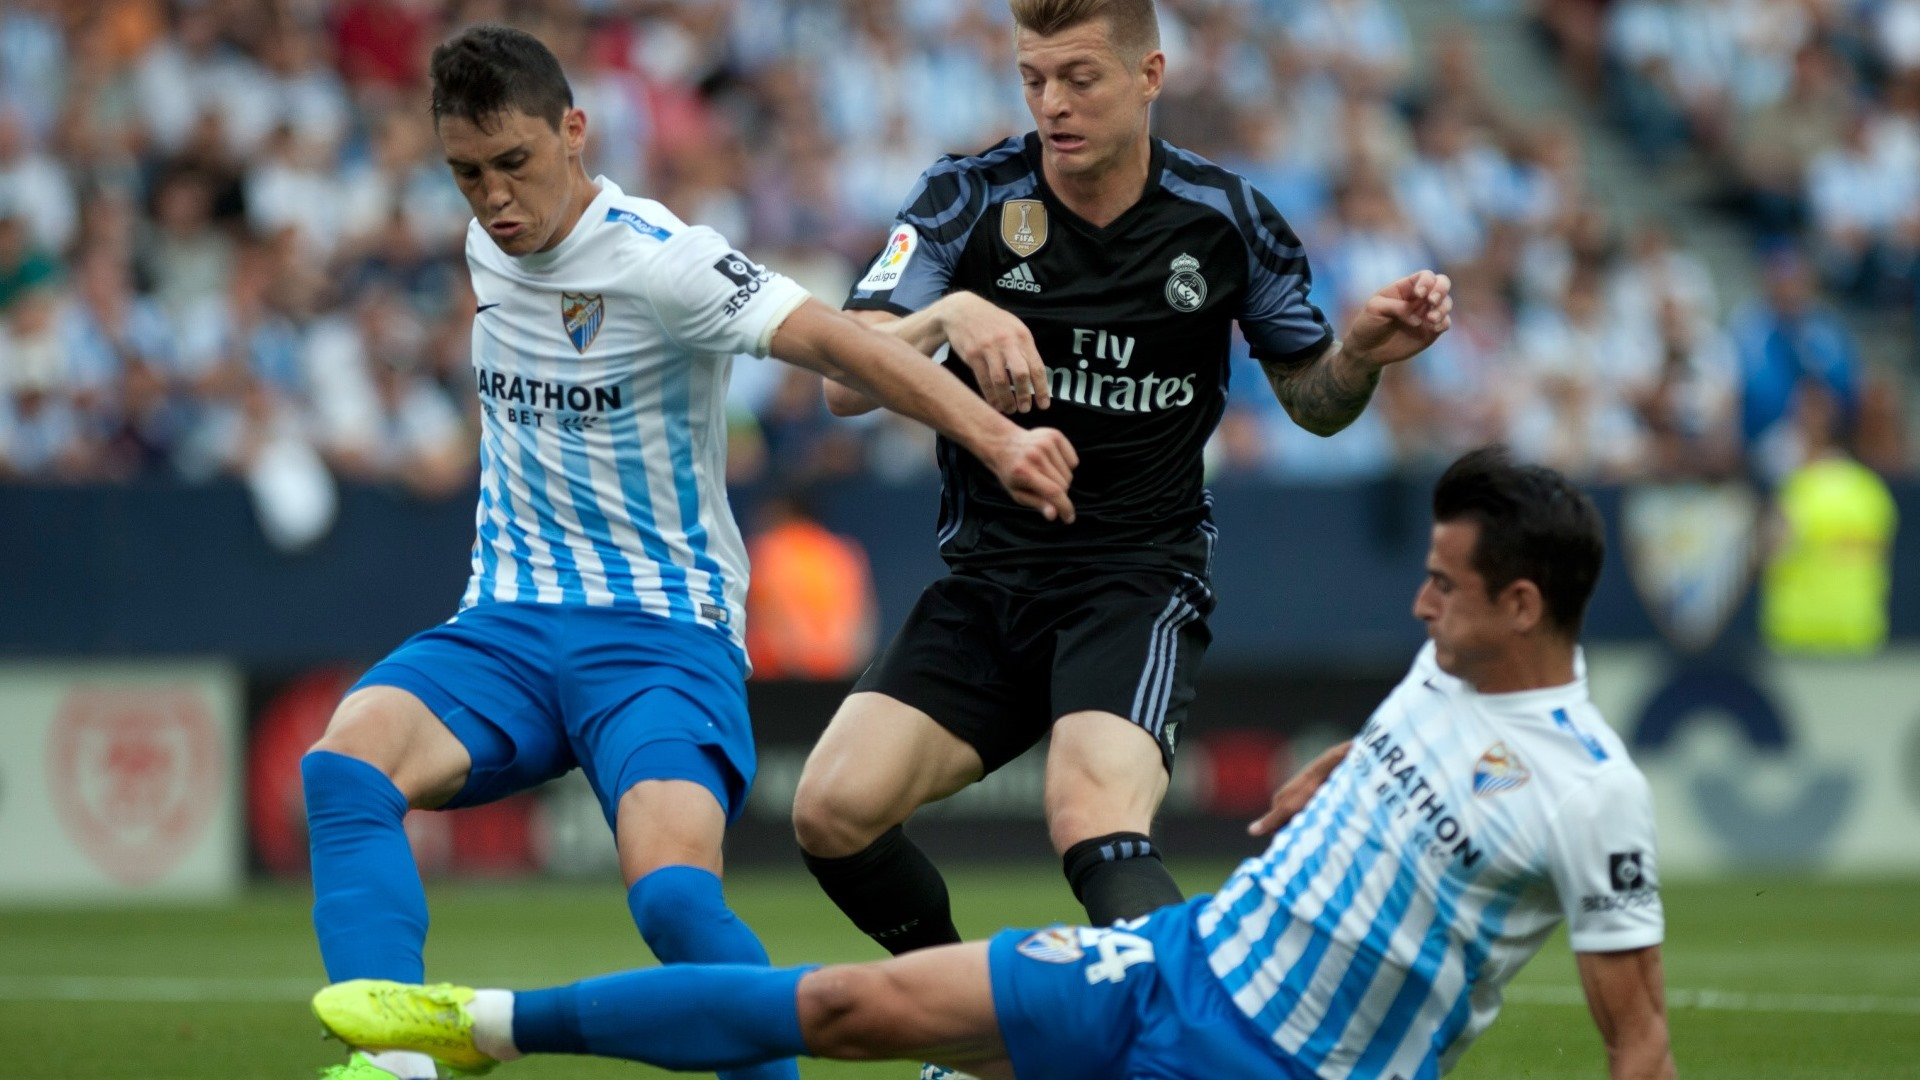 Federico Ricca Luis Hernanfez Toni Kroos Malaga Real Madrid LaLiga 21052017